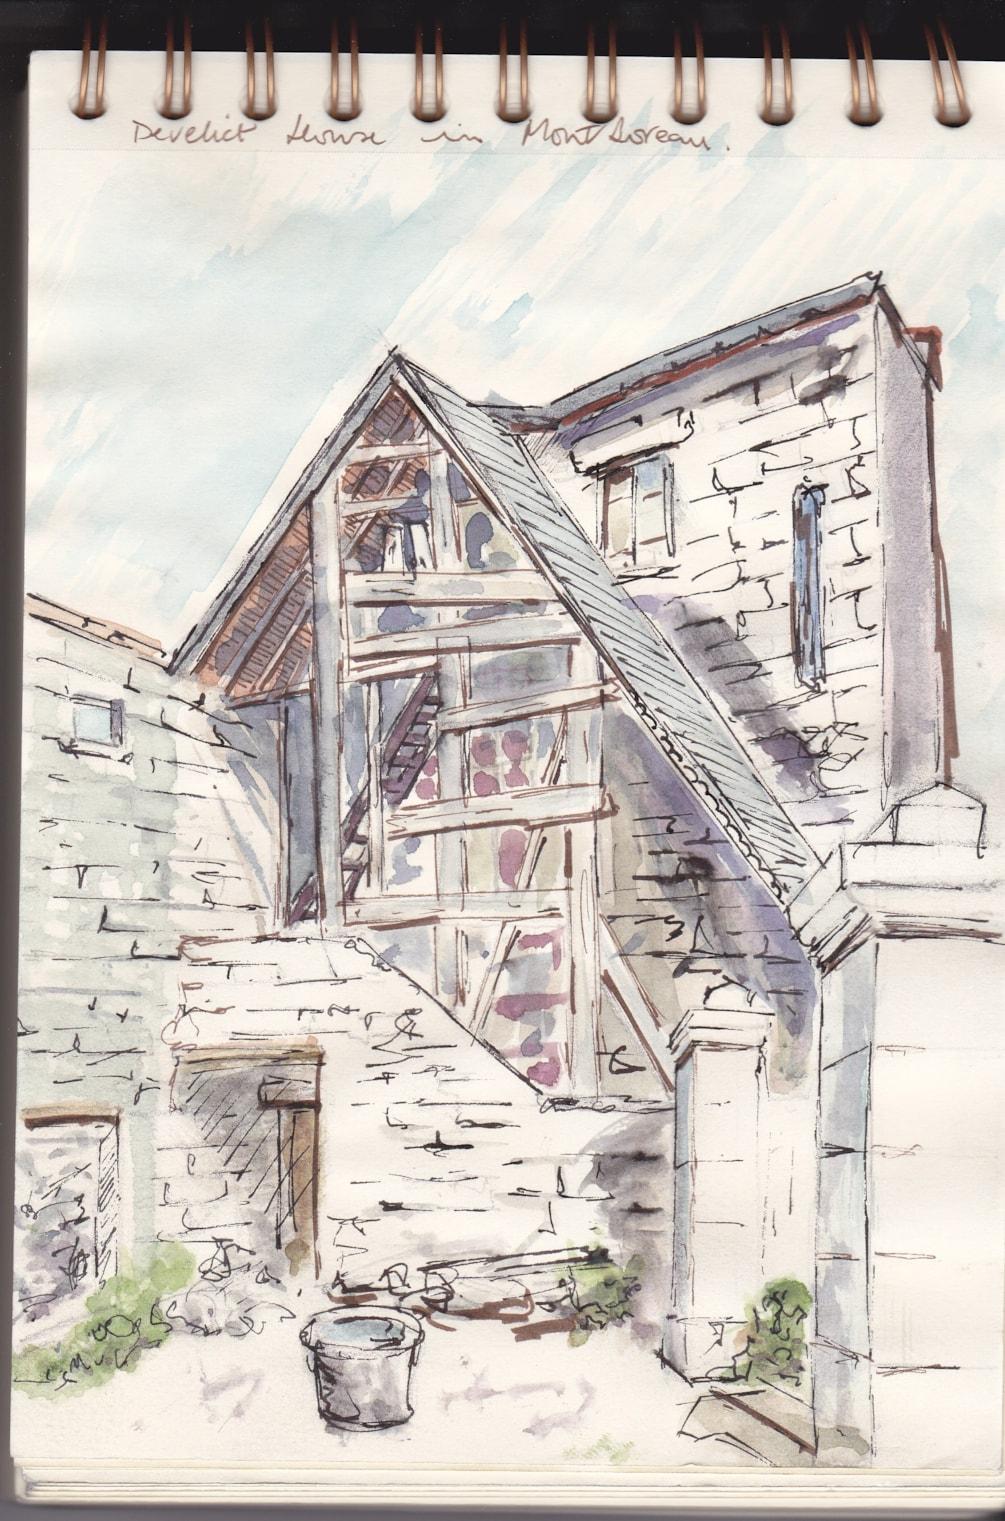 derelict house at Montsoreau